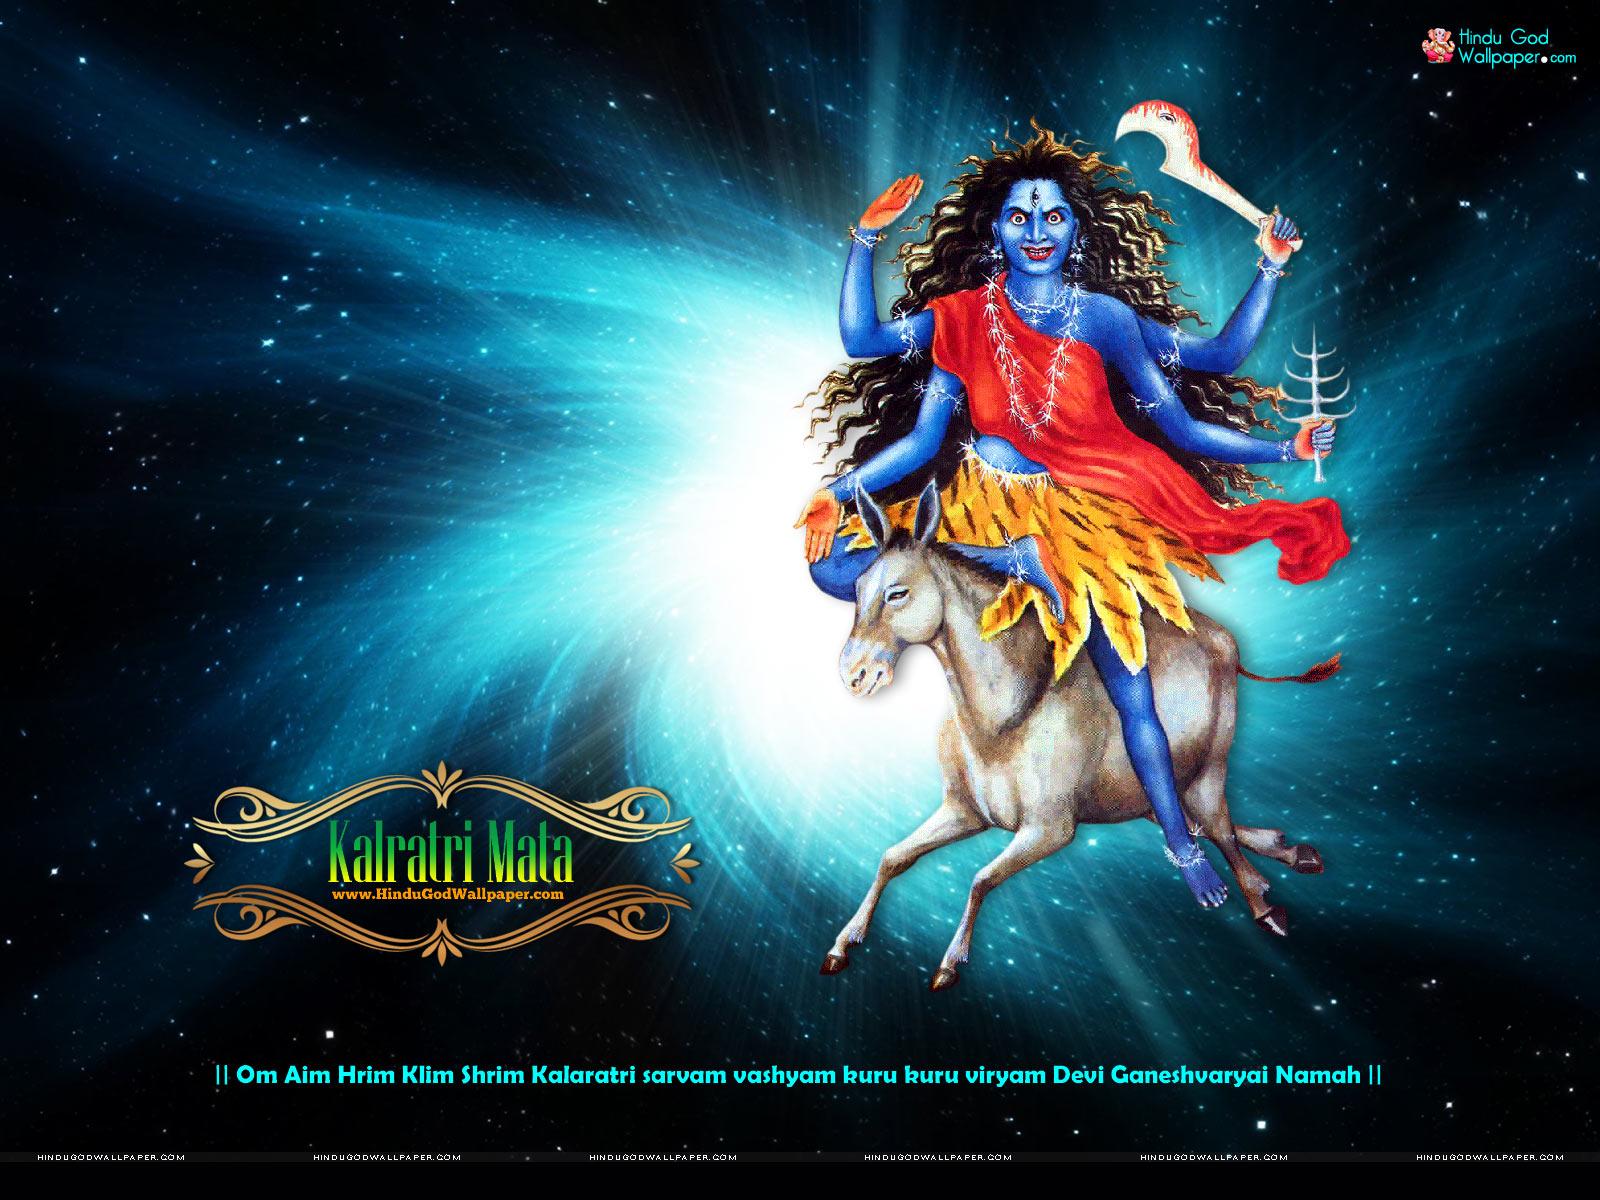 Sonarika Bhadoria Hd Wallpapers Kalratri Mata Wallpapers Photos Amp Images Download